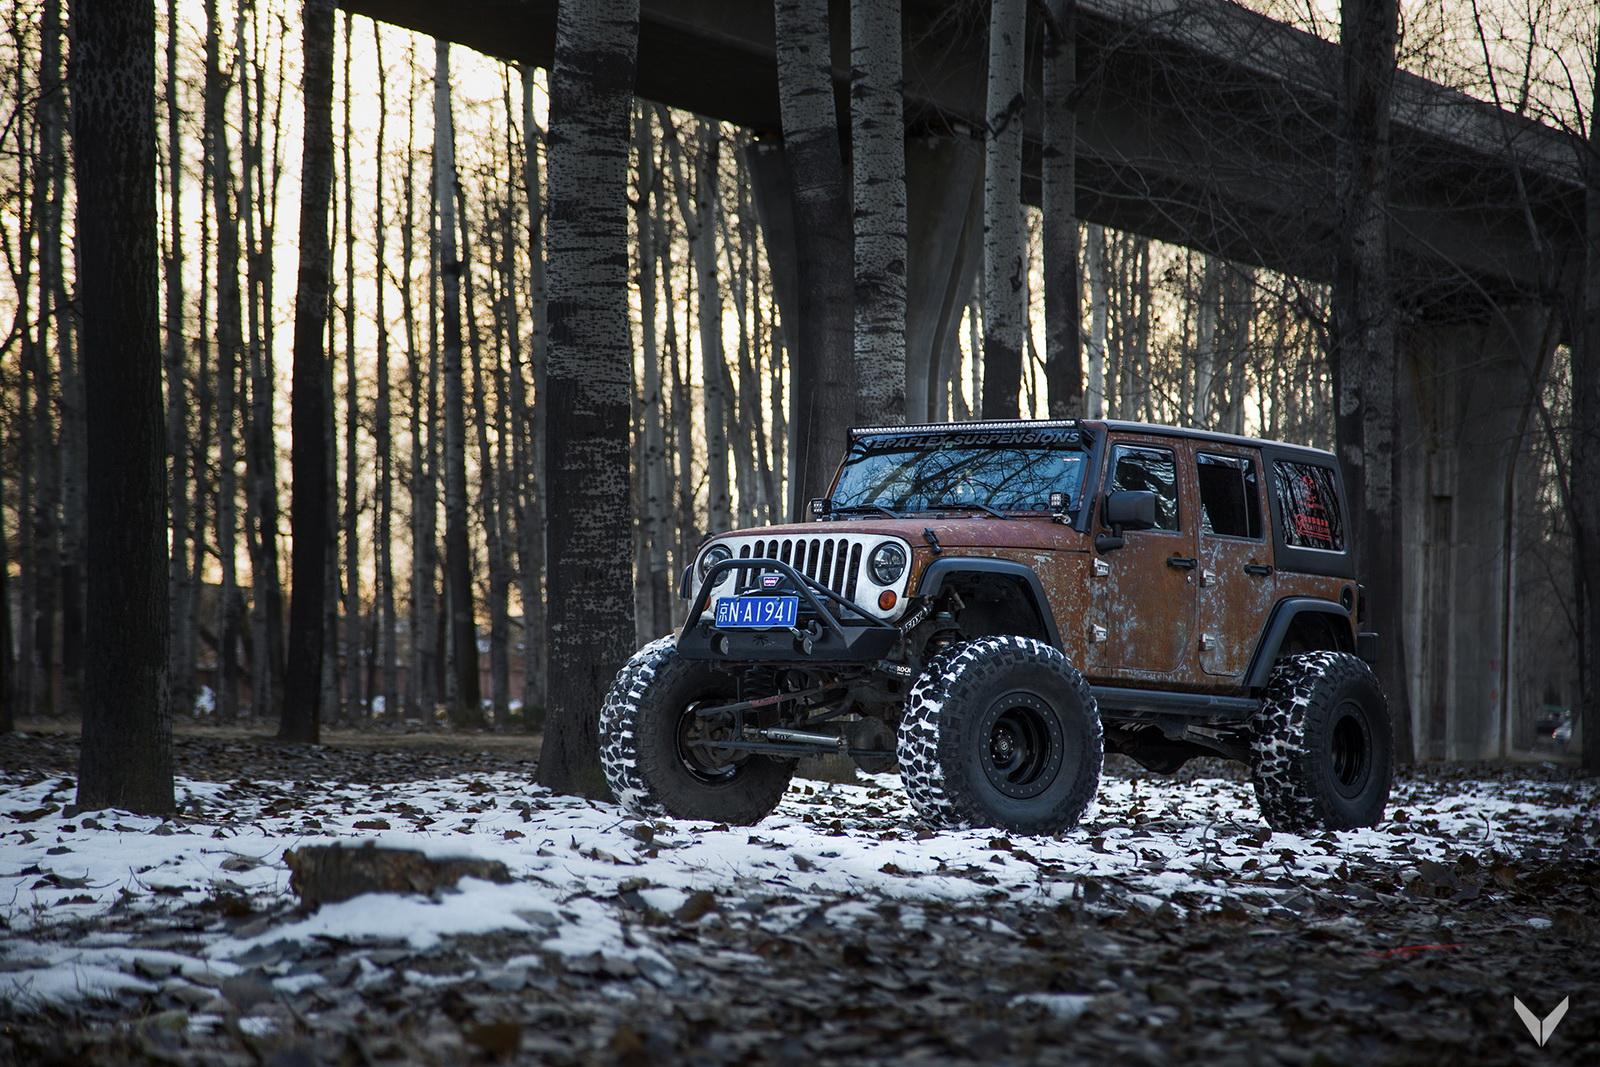 Jeep Wrangler Hunting Unlimited by Vilner (1)